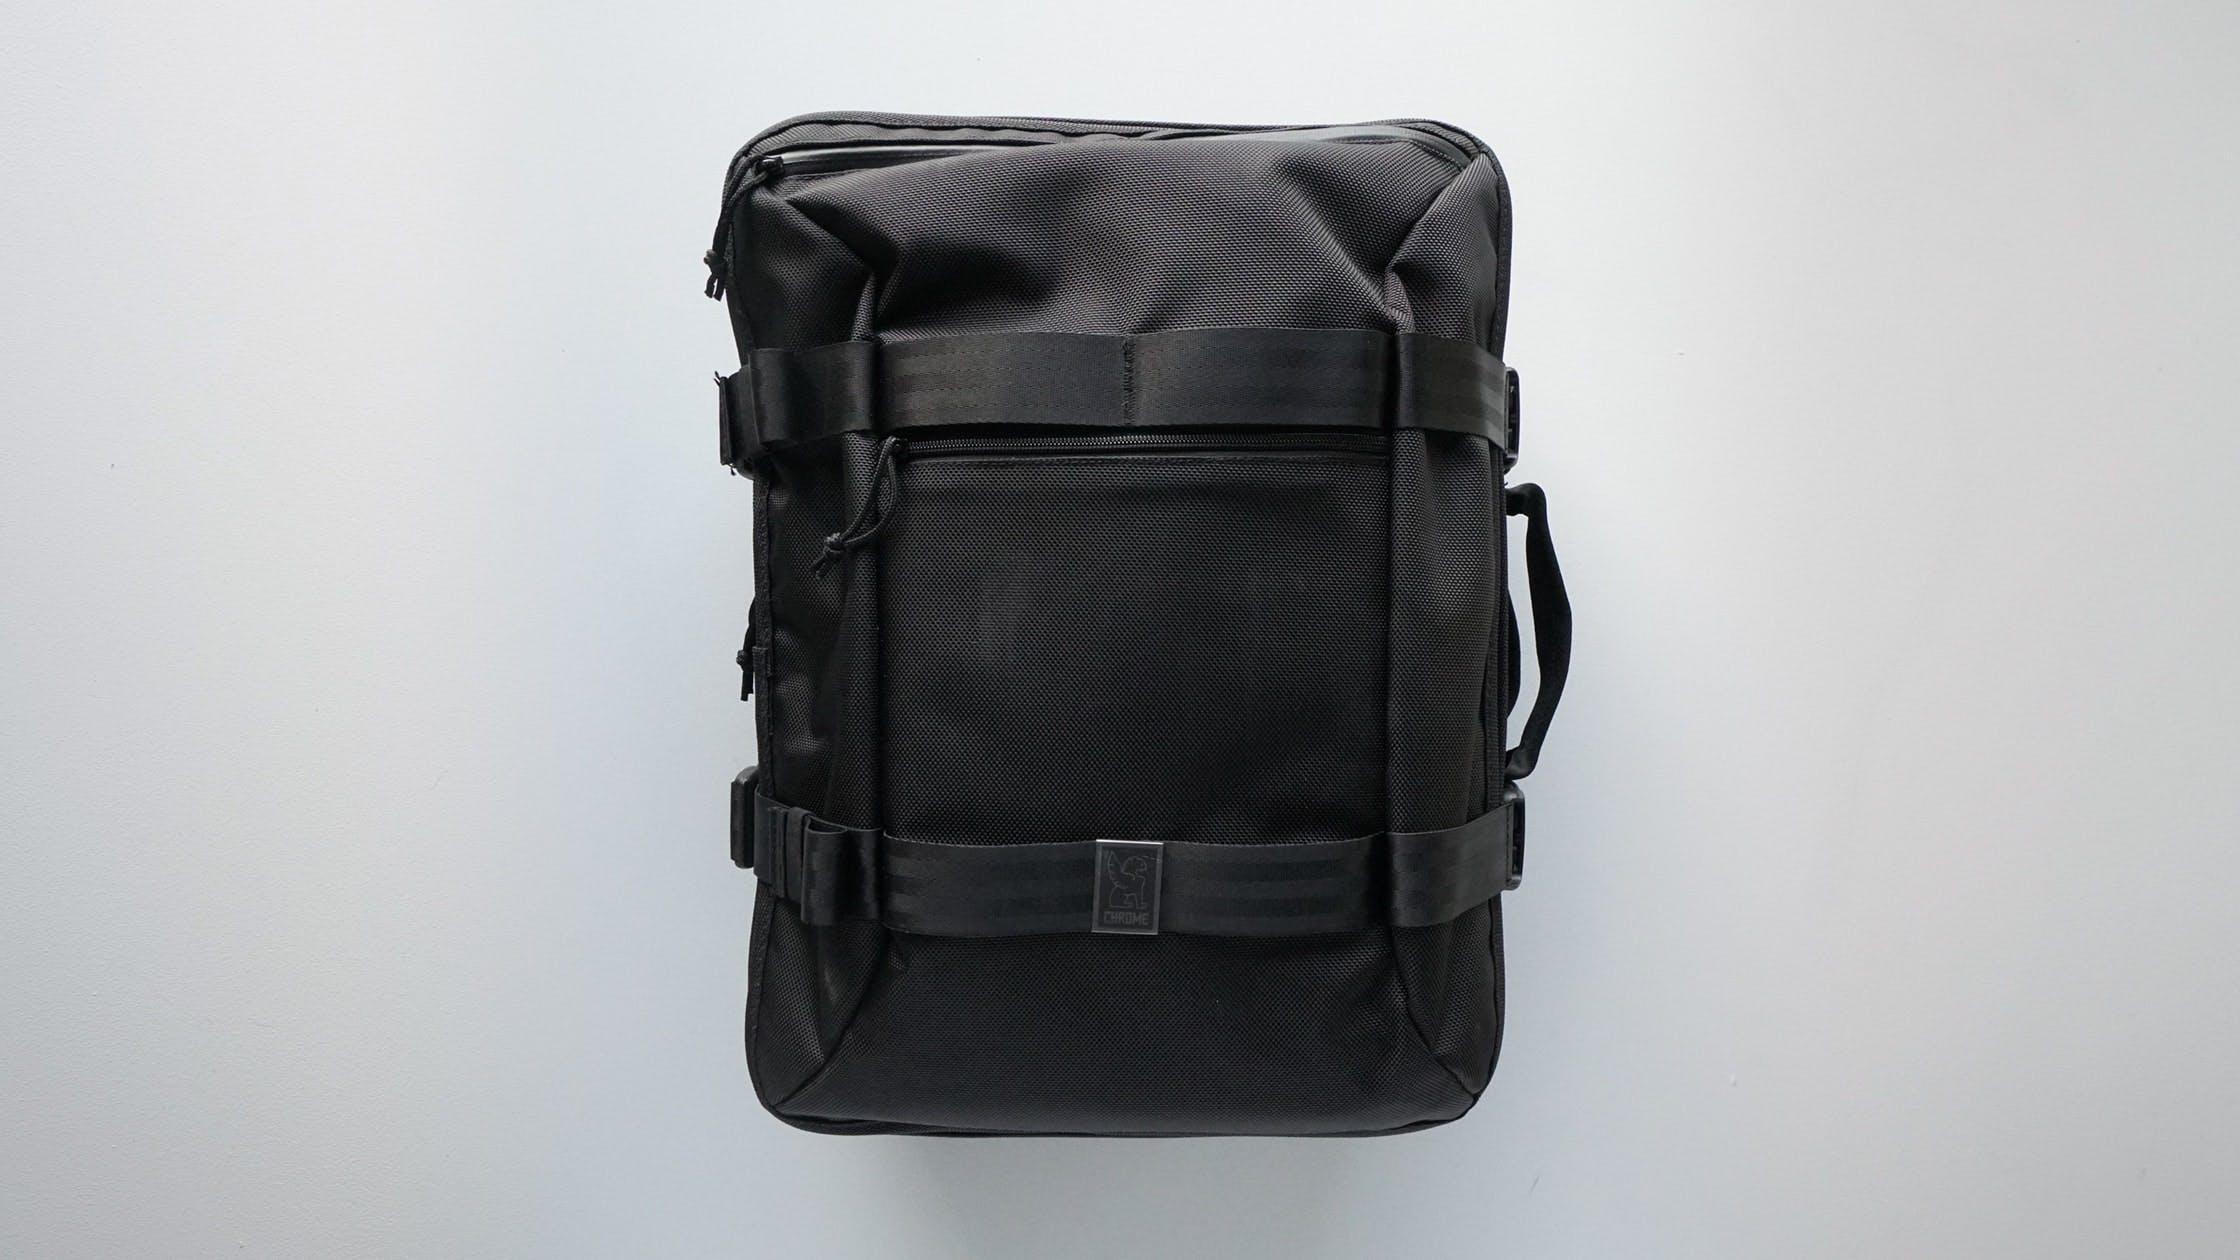 83a2c753f09f Chrome Macheto Travel Backpack Review